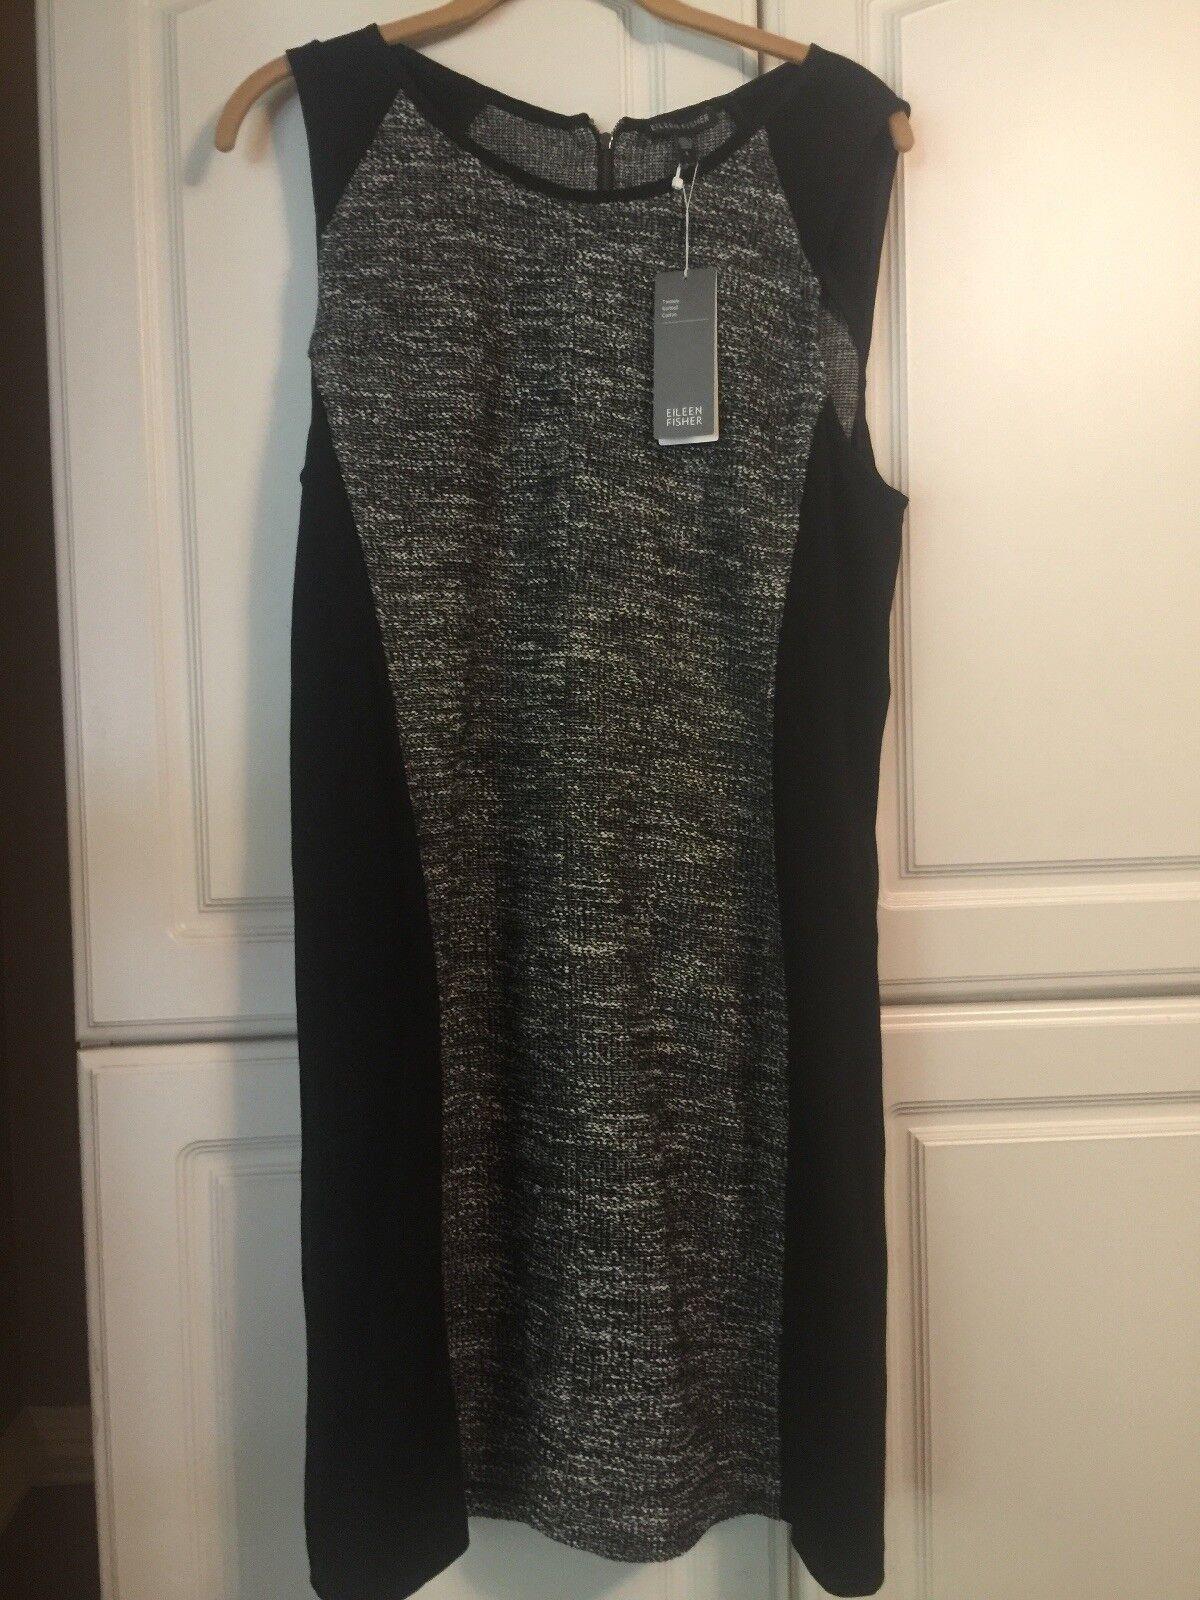 Eileen Fisher Round Neck K/l Tweedy Knitted Cotton Dress NWT (298.00 MSP) Large